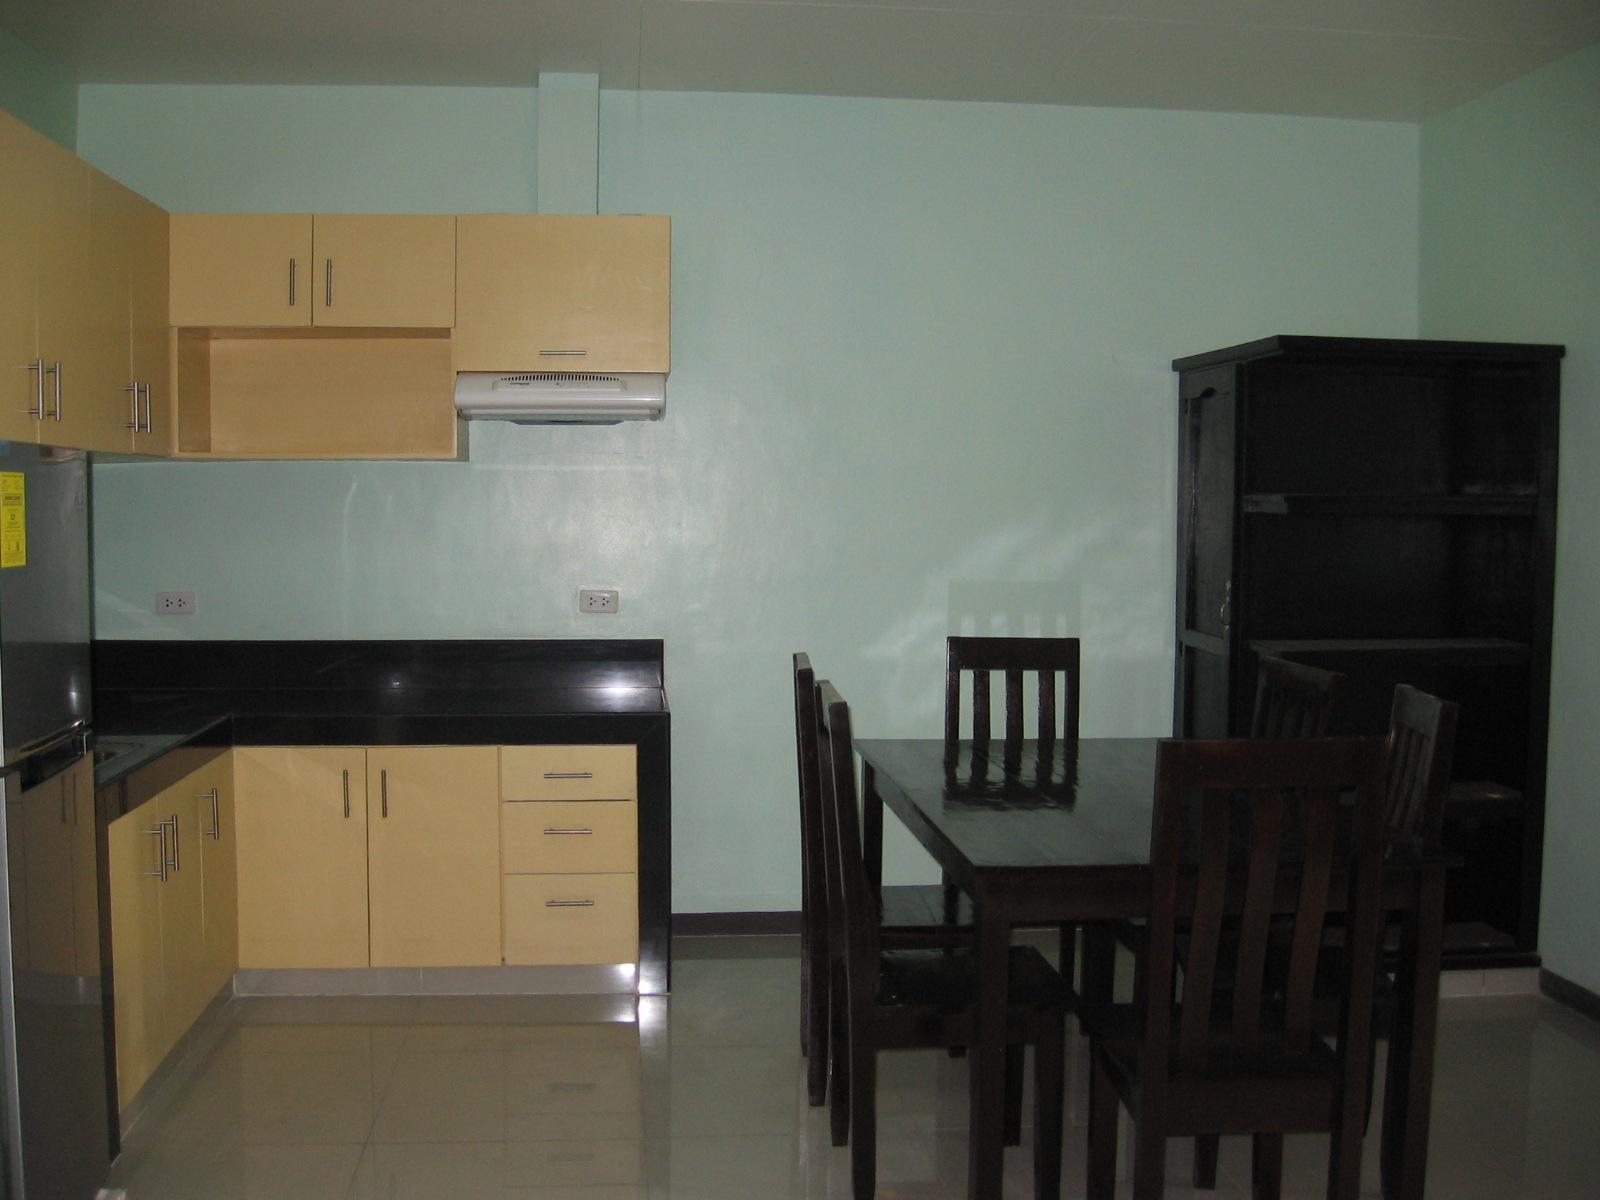 2-bedrooms-apartment-located-in-labangon-cebu-city